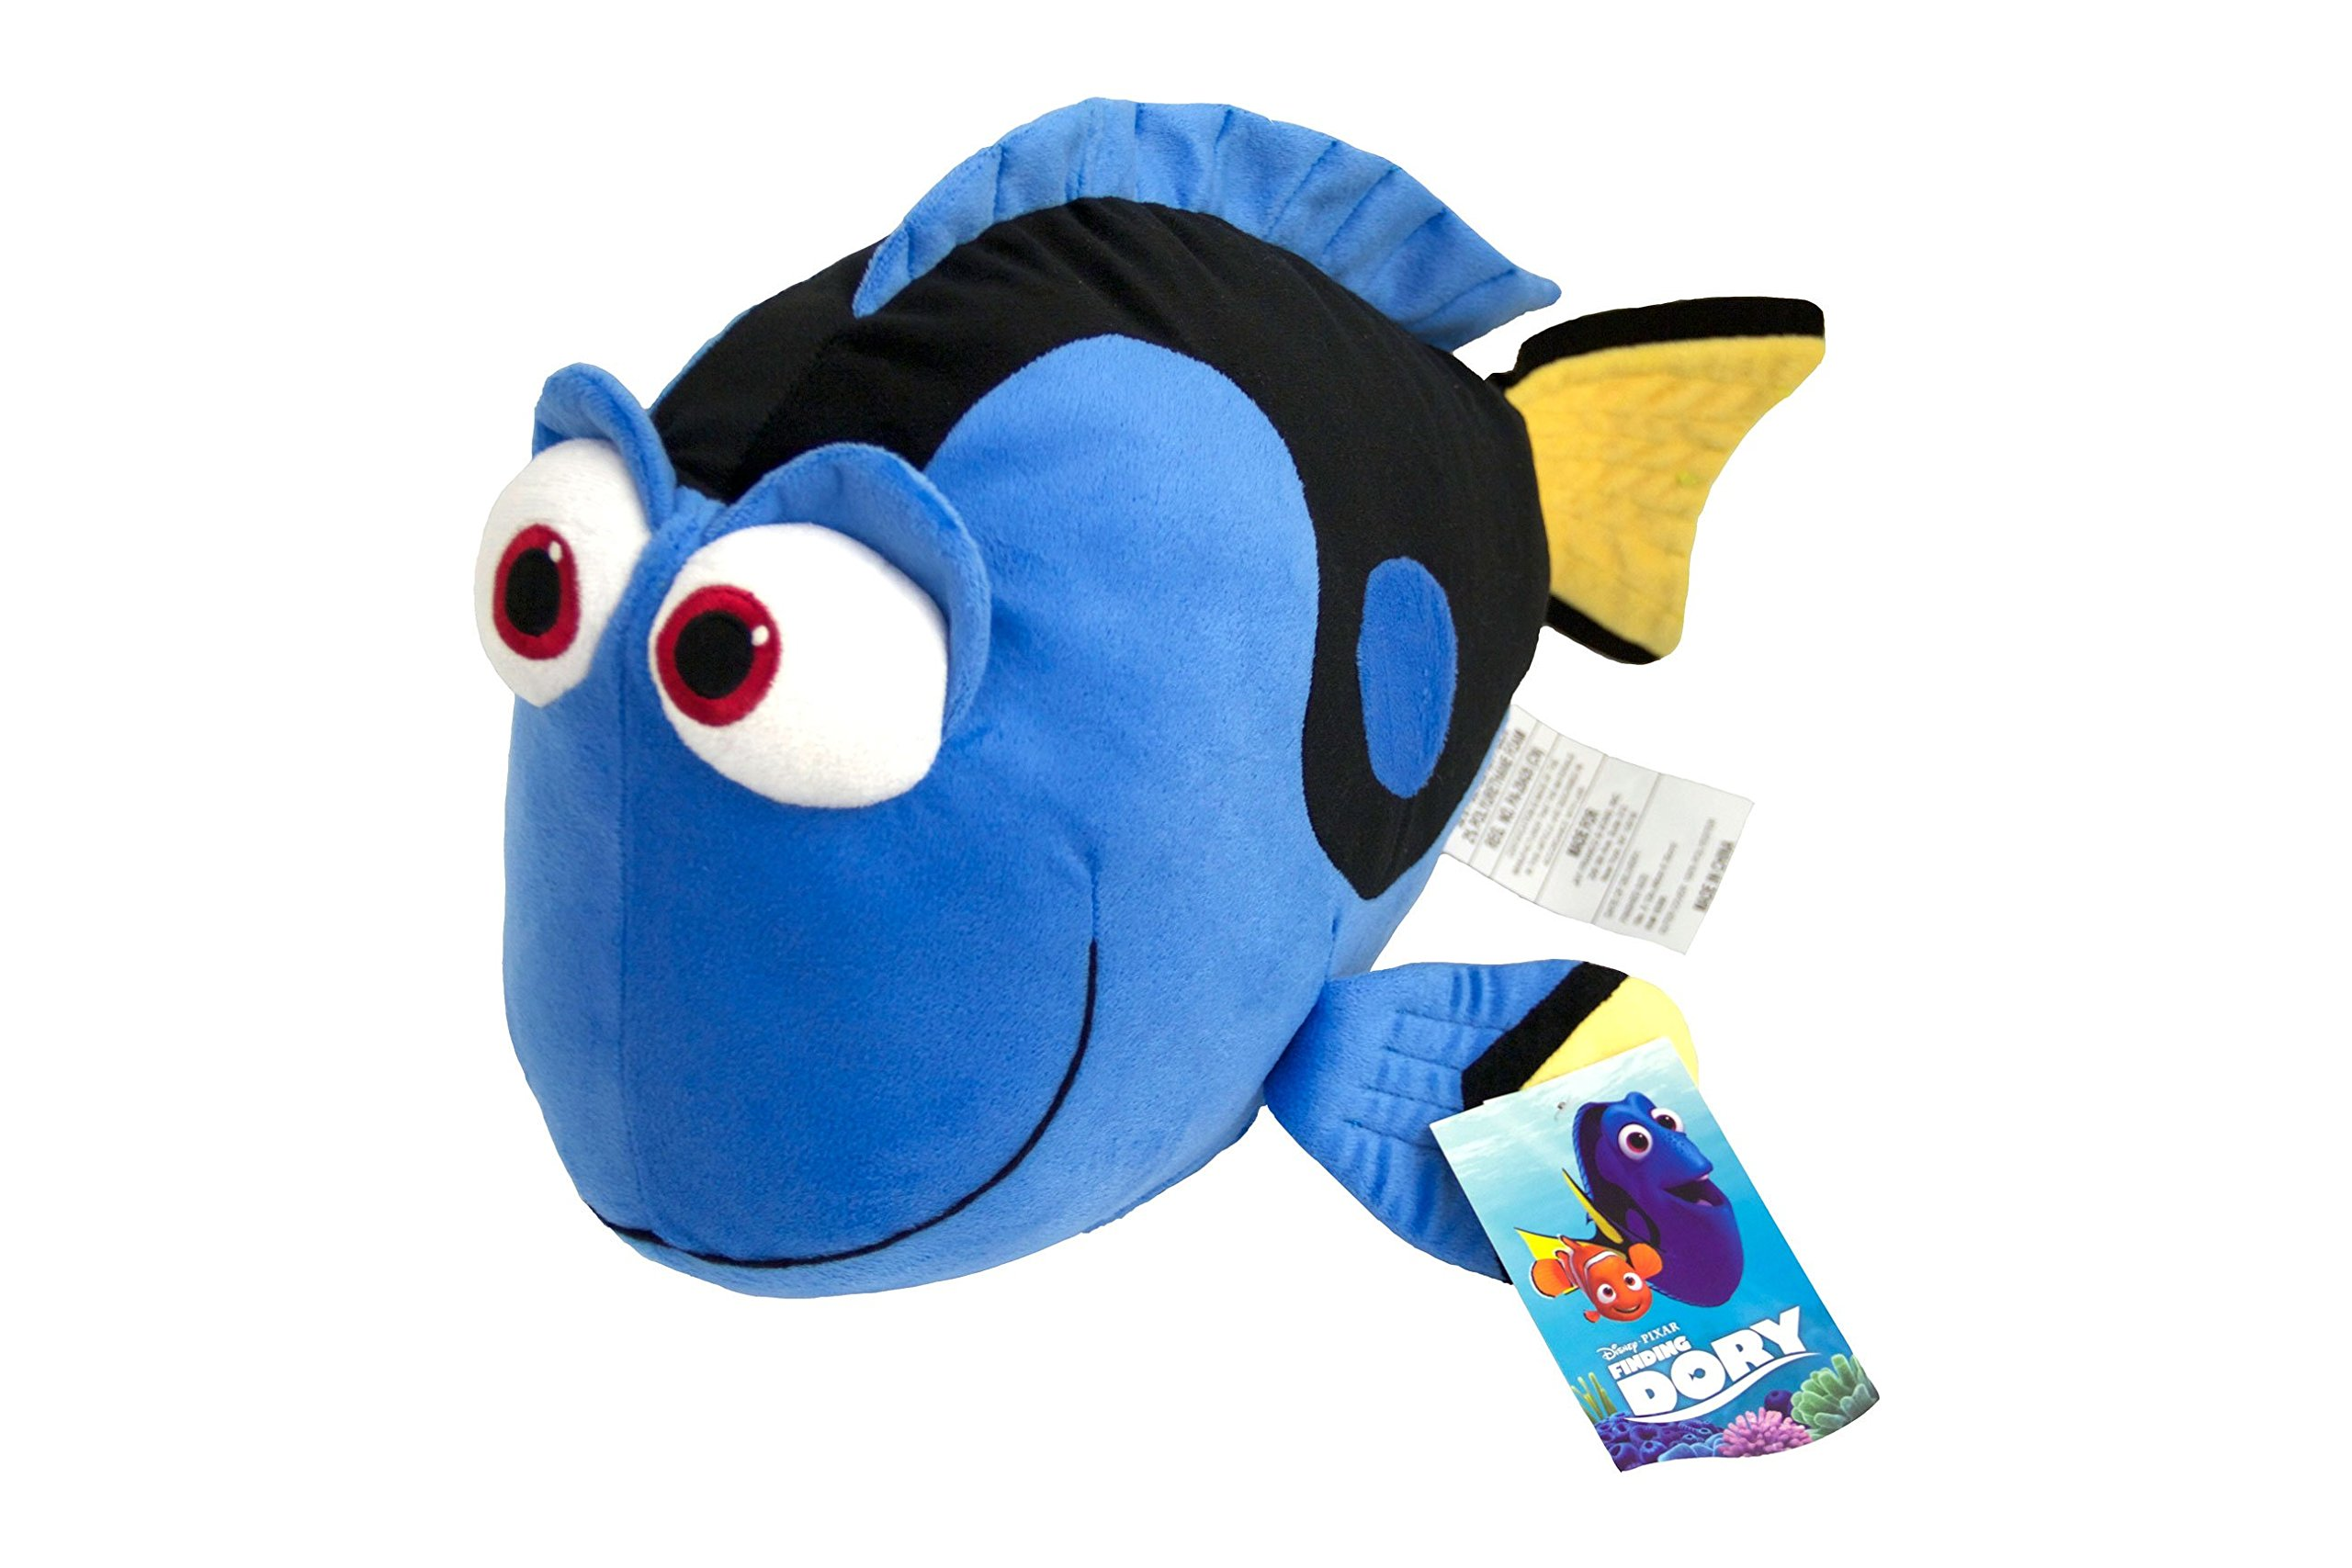 Disney Pixar Finding Dory Plush Pillow Buddy, 20''